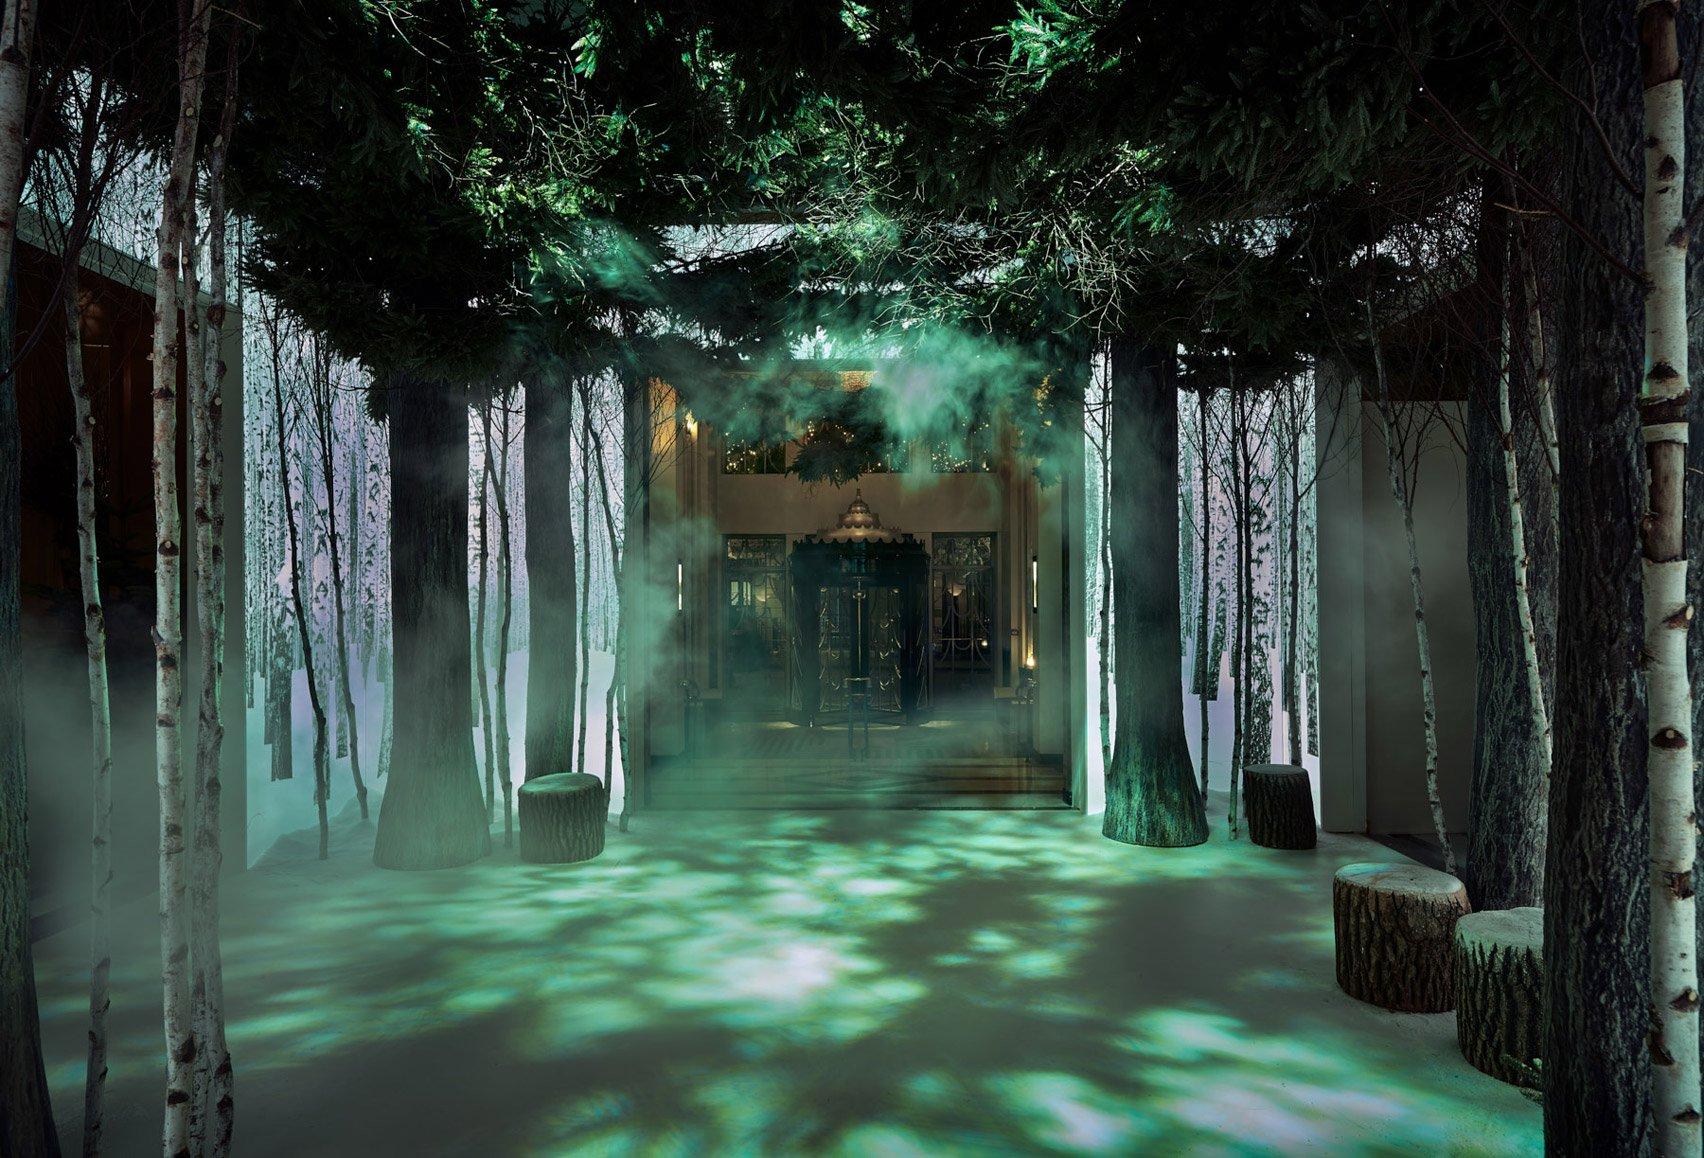 jony-ive-marc-newson-christmas-tree-design-claridges-london_dezeen_1704_col_0